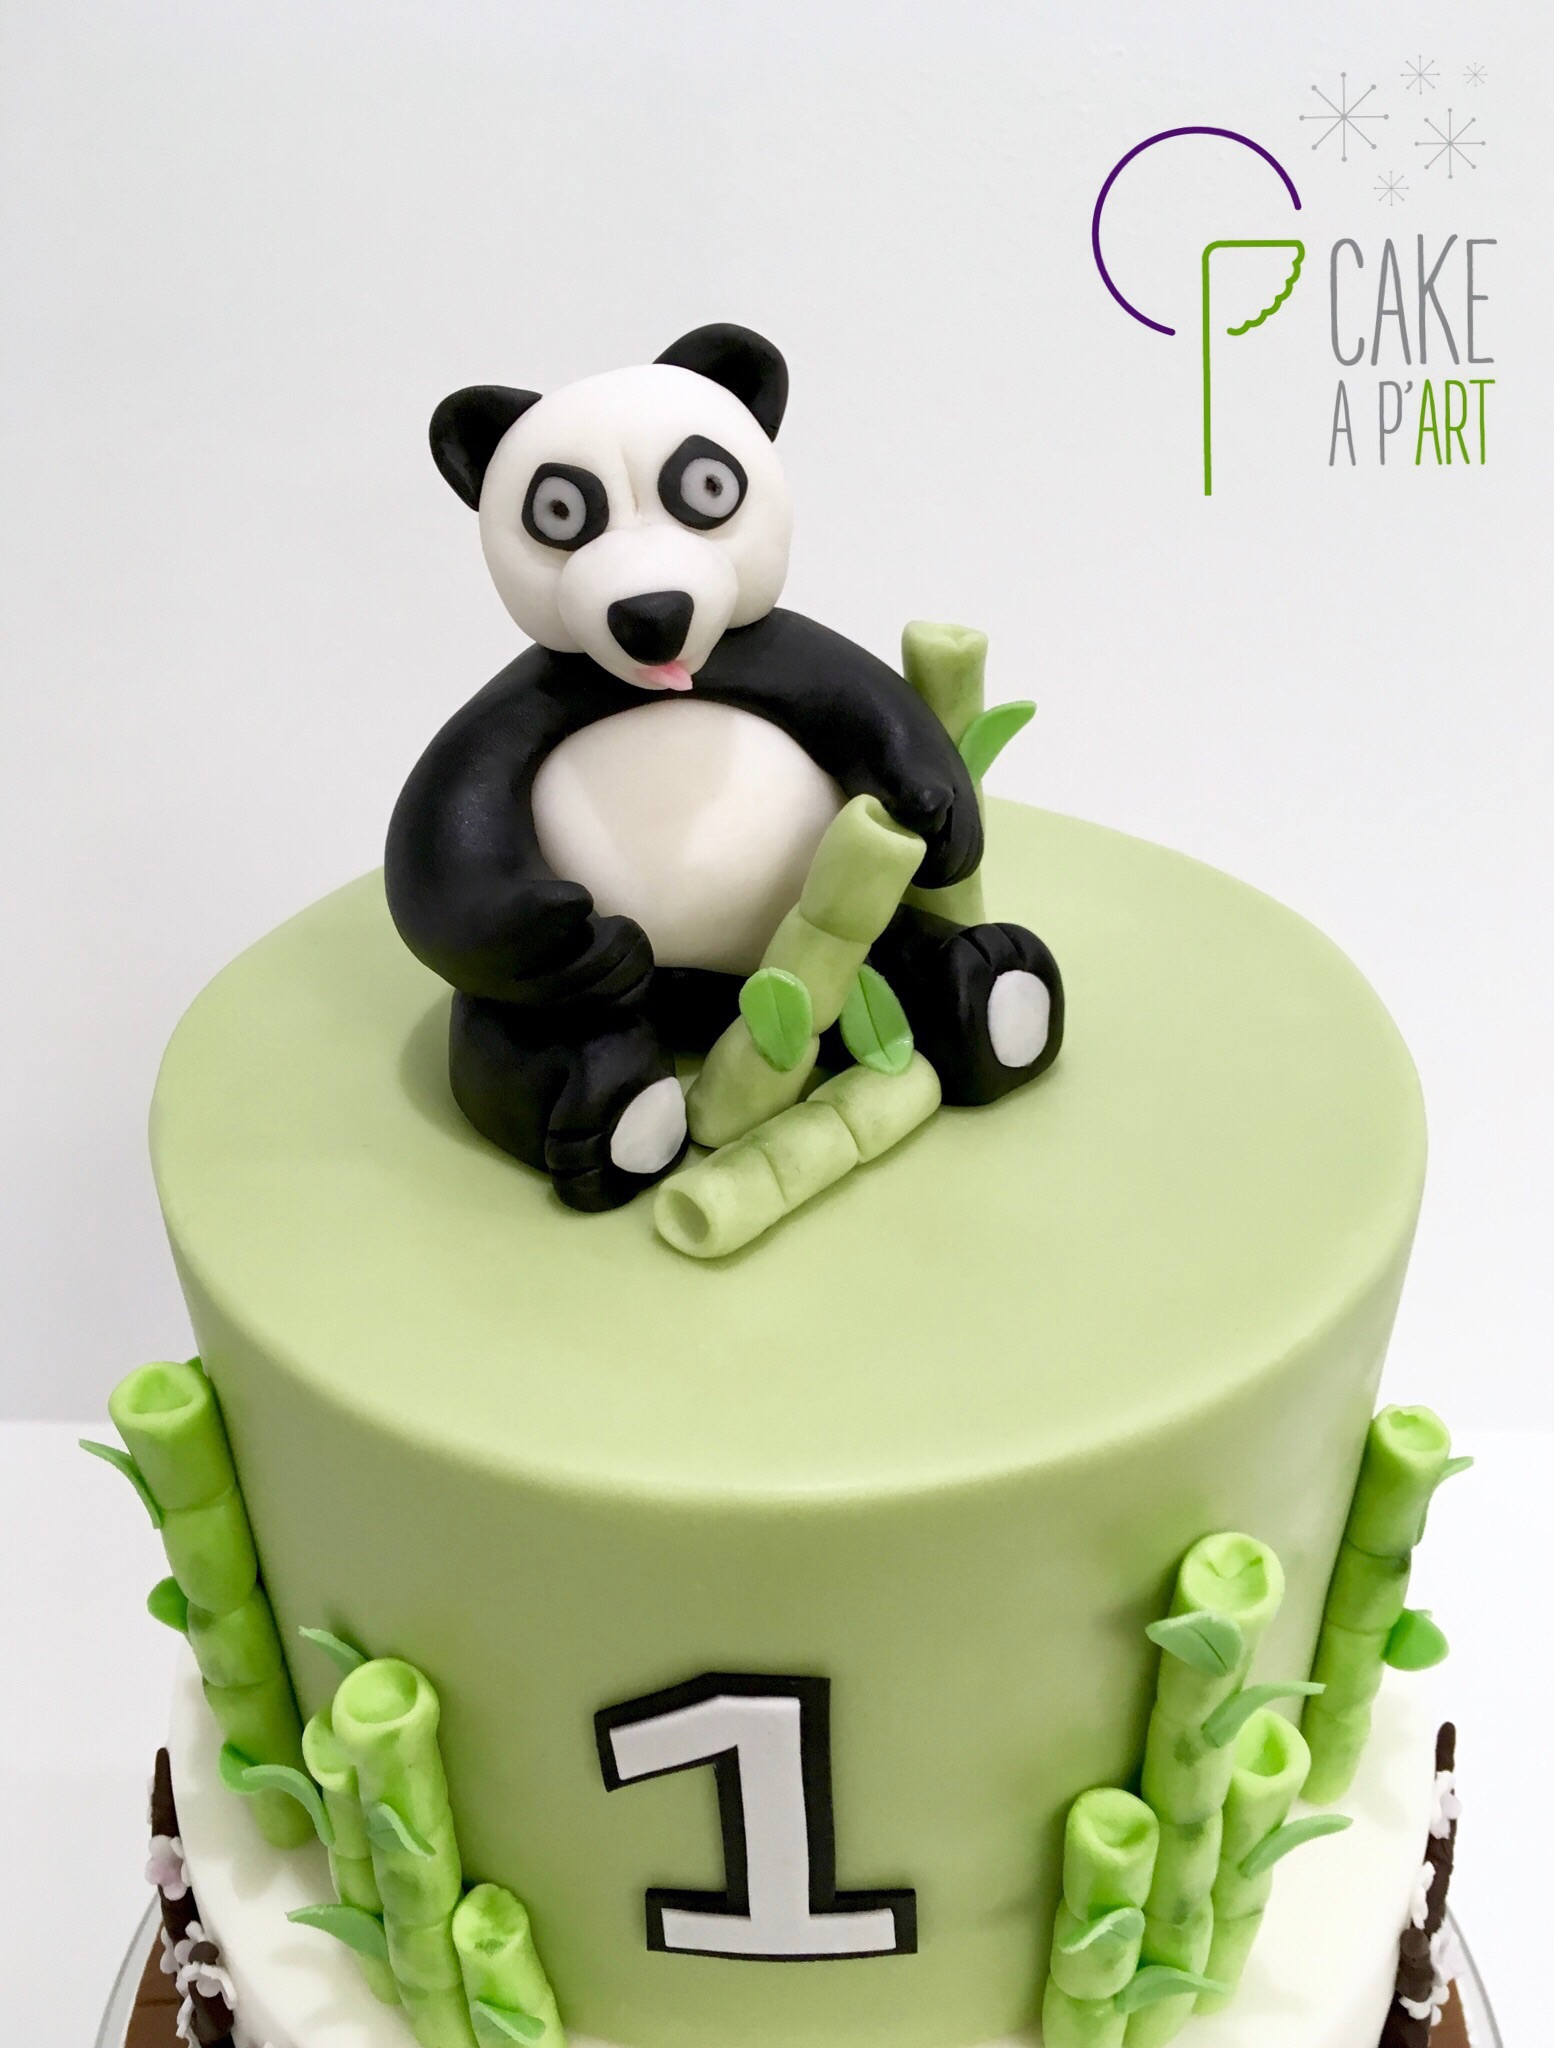 gateau-anniversaire-panda-asie-cakeapart-1